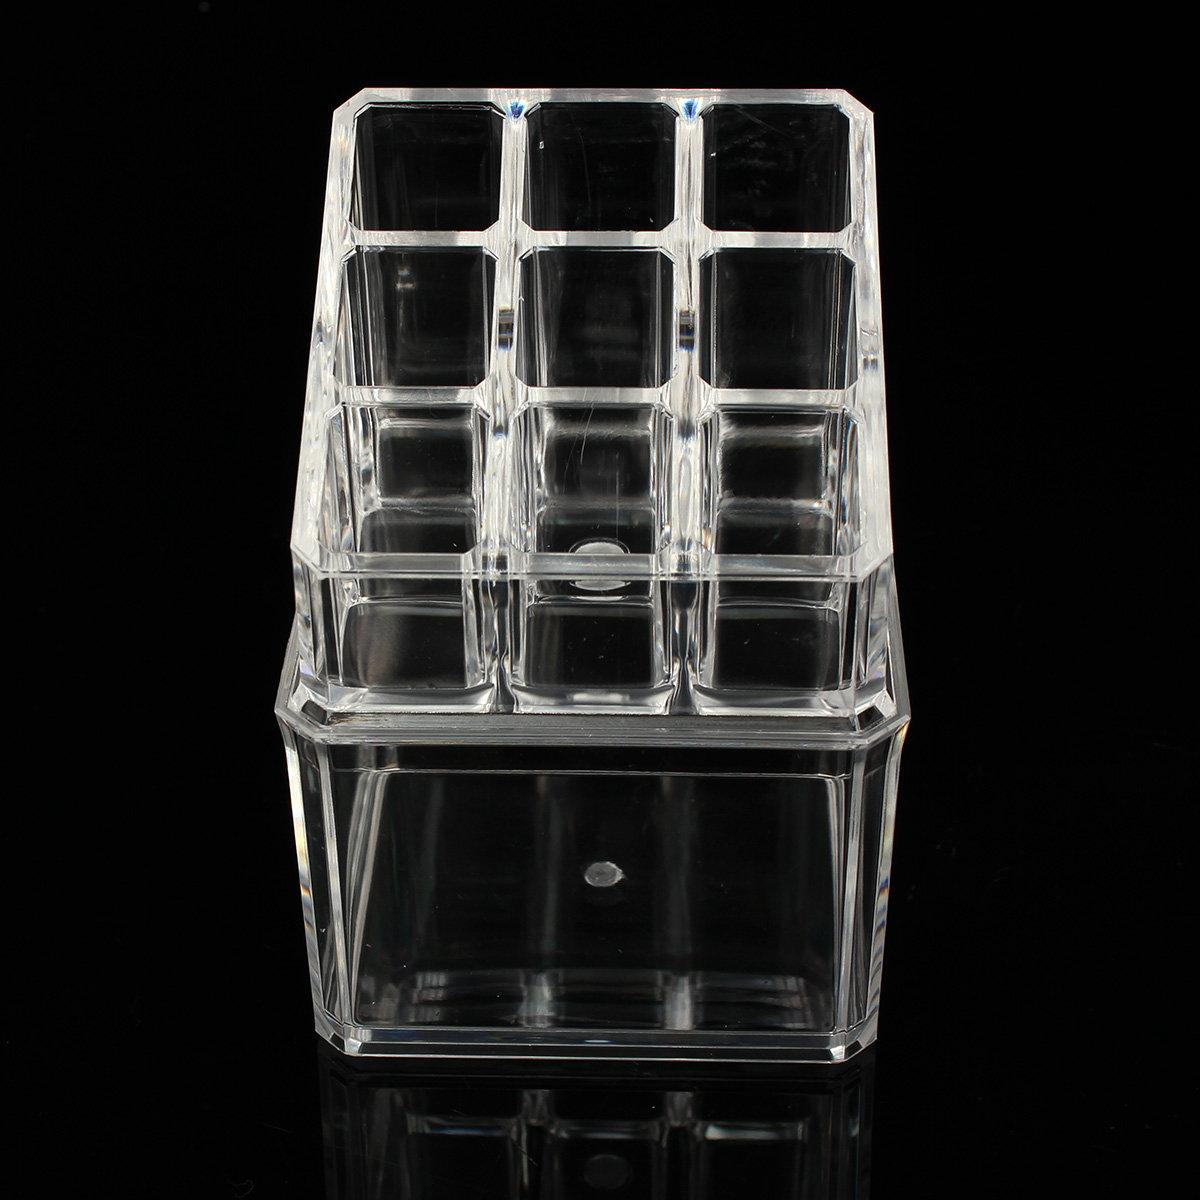 2 Tiers Acrylic Clear Cosmetic Storage Organizer Nail Polish Brush Jewelry Display Case